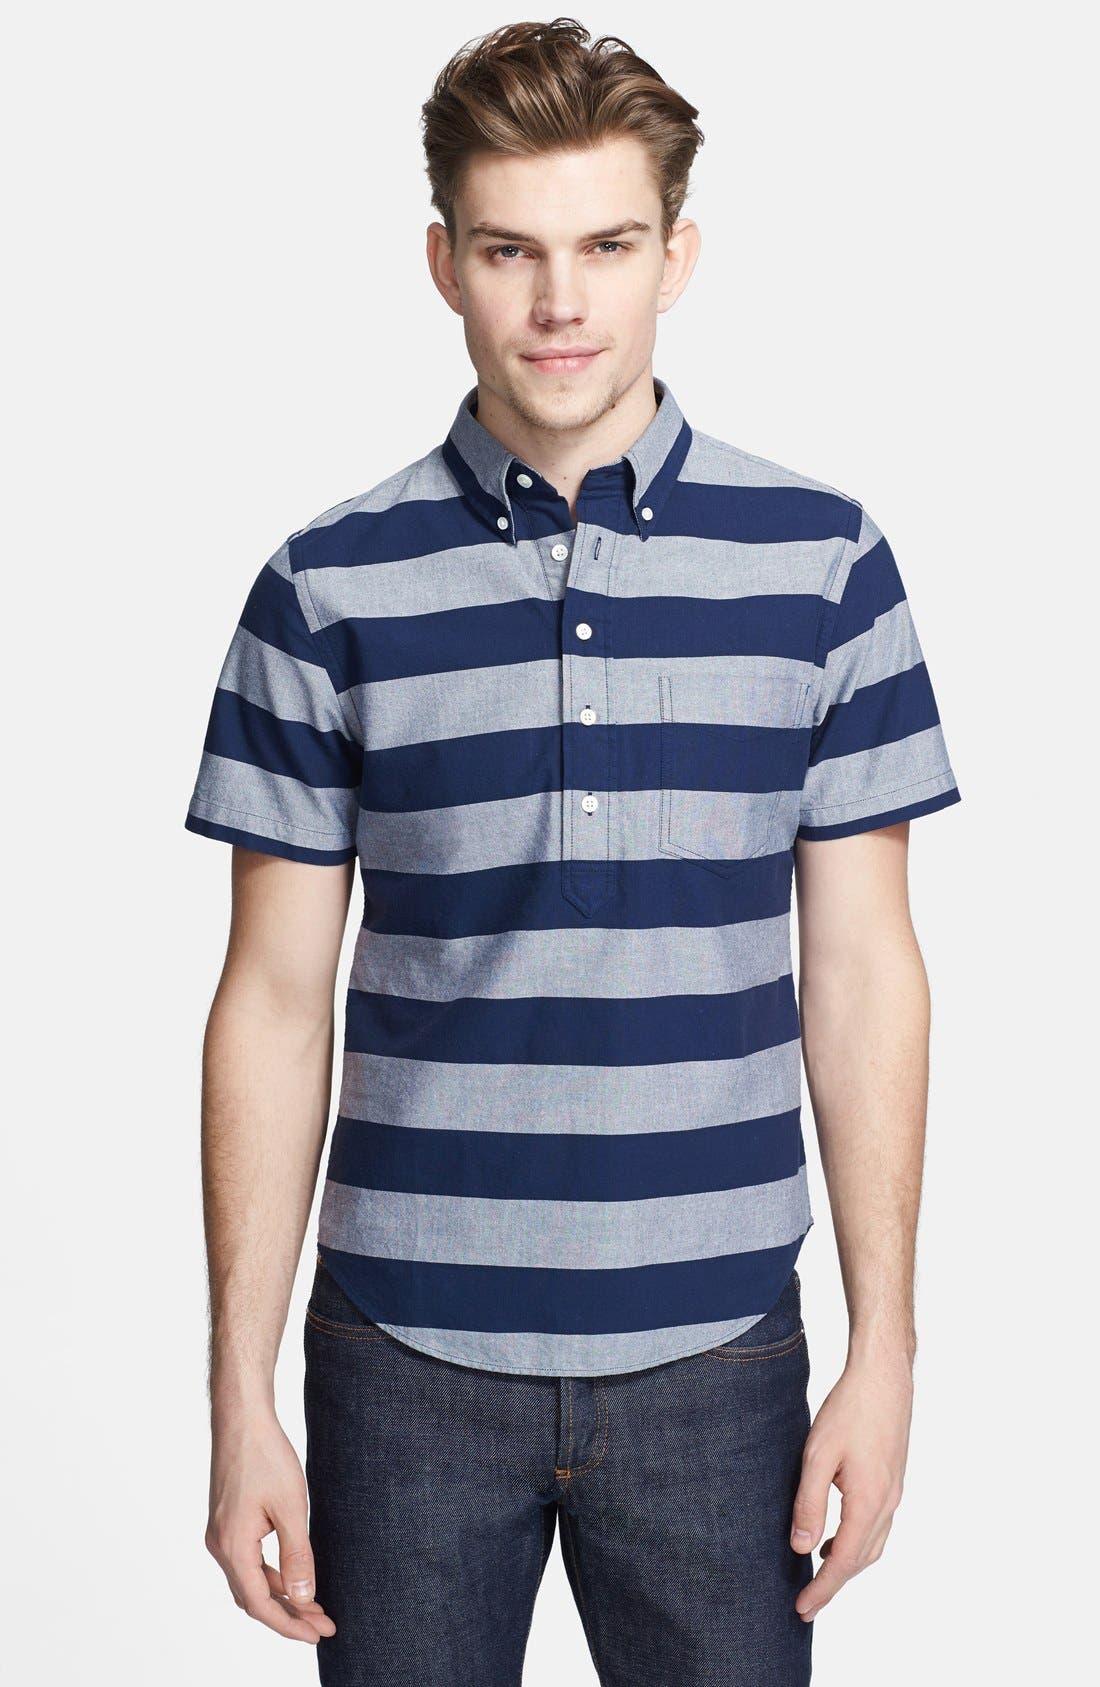 Main Image - Jack Spade 'Percy' Short Sleeve Stripe Pullover Shirt